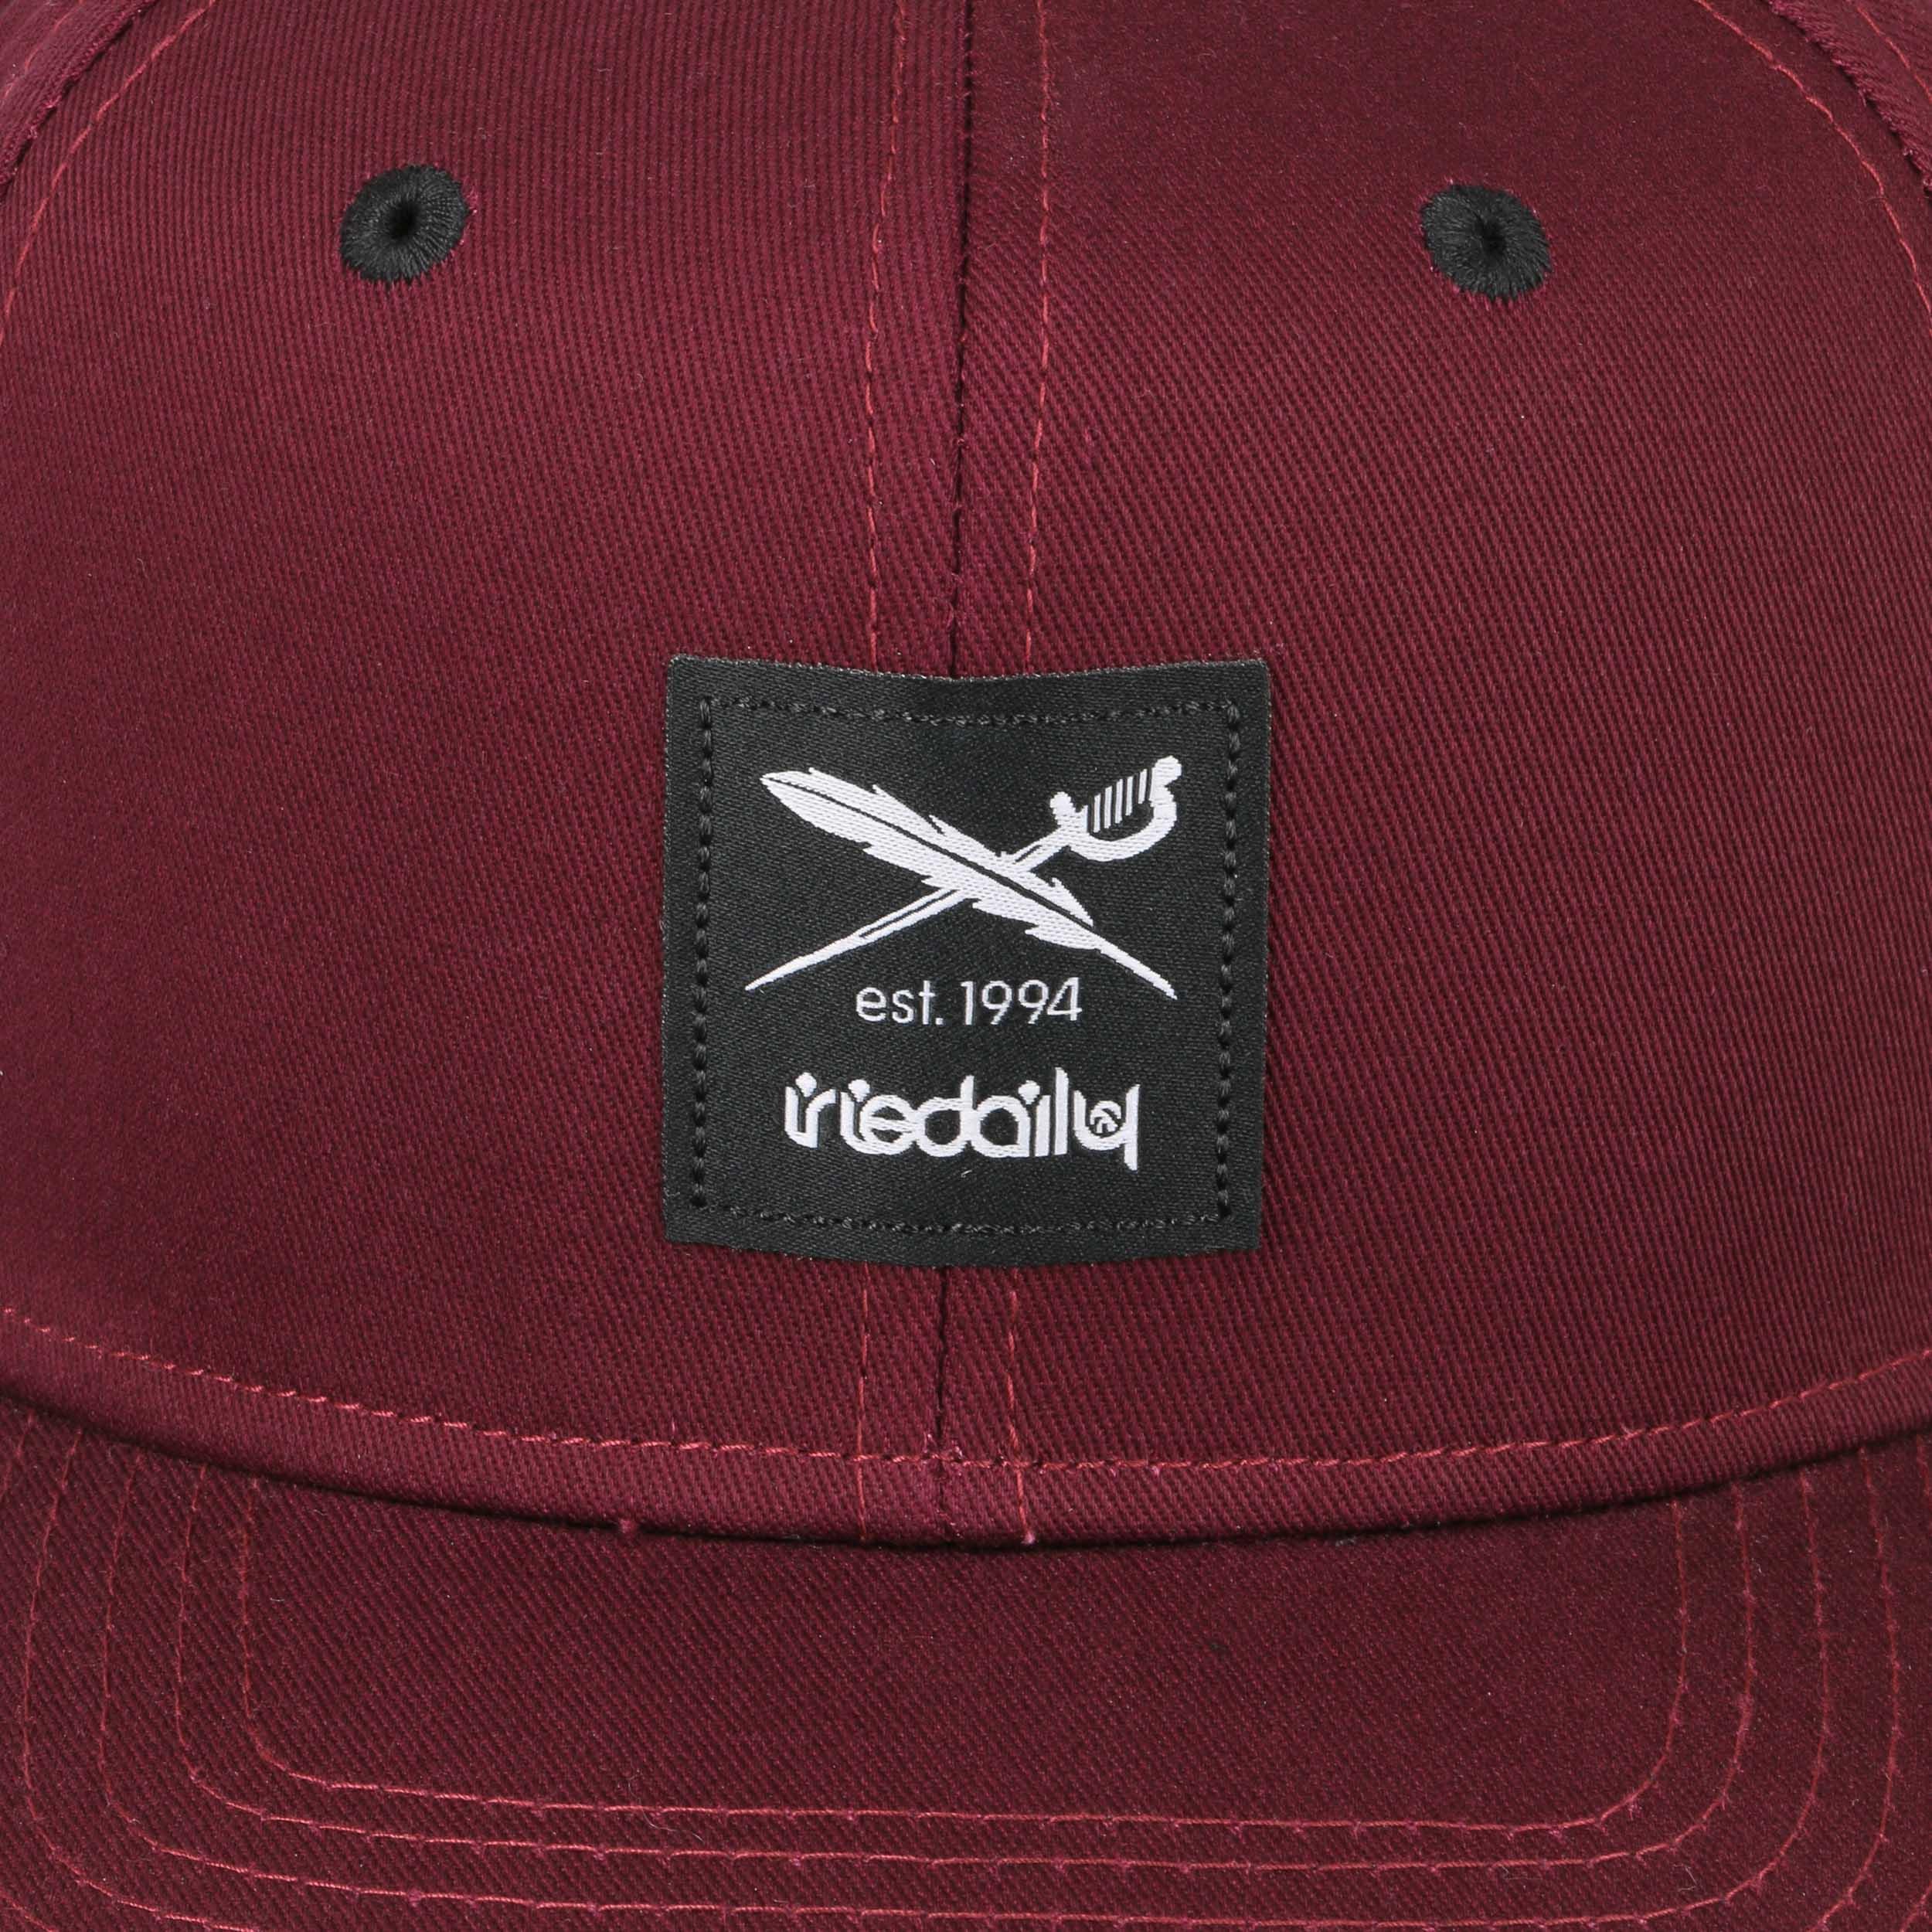 0e90b3af4fee18 ... Daily Flag 2 Snapback Cap by iriedaily - black 4 ...